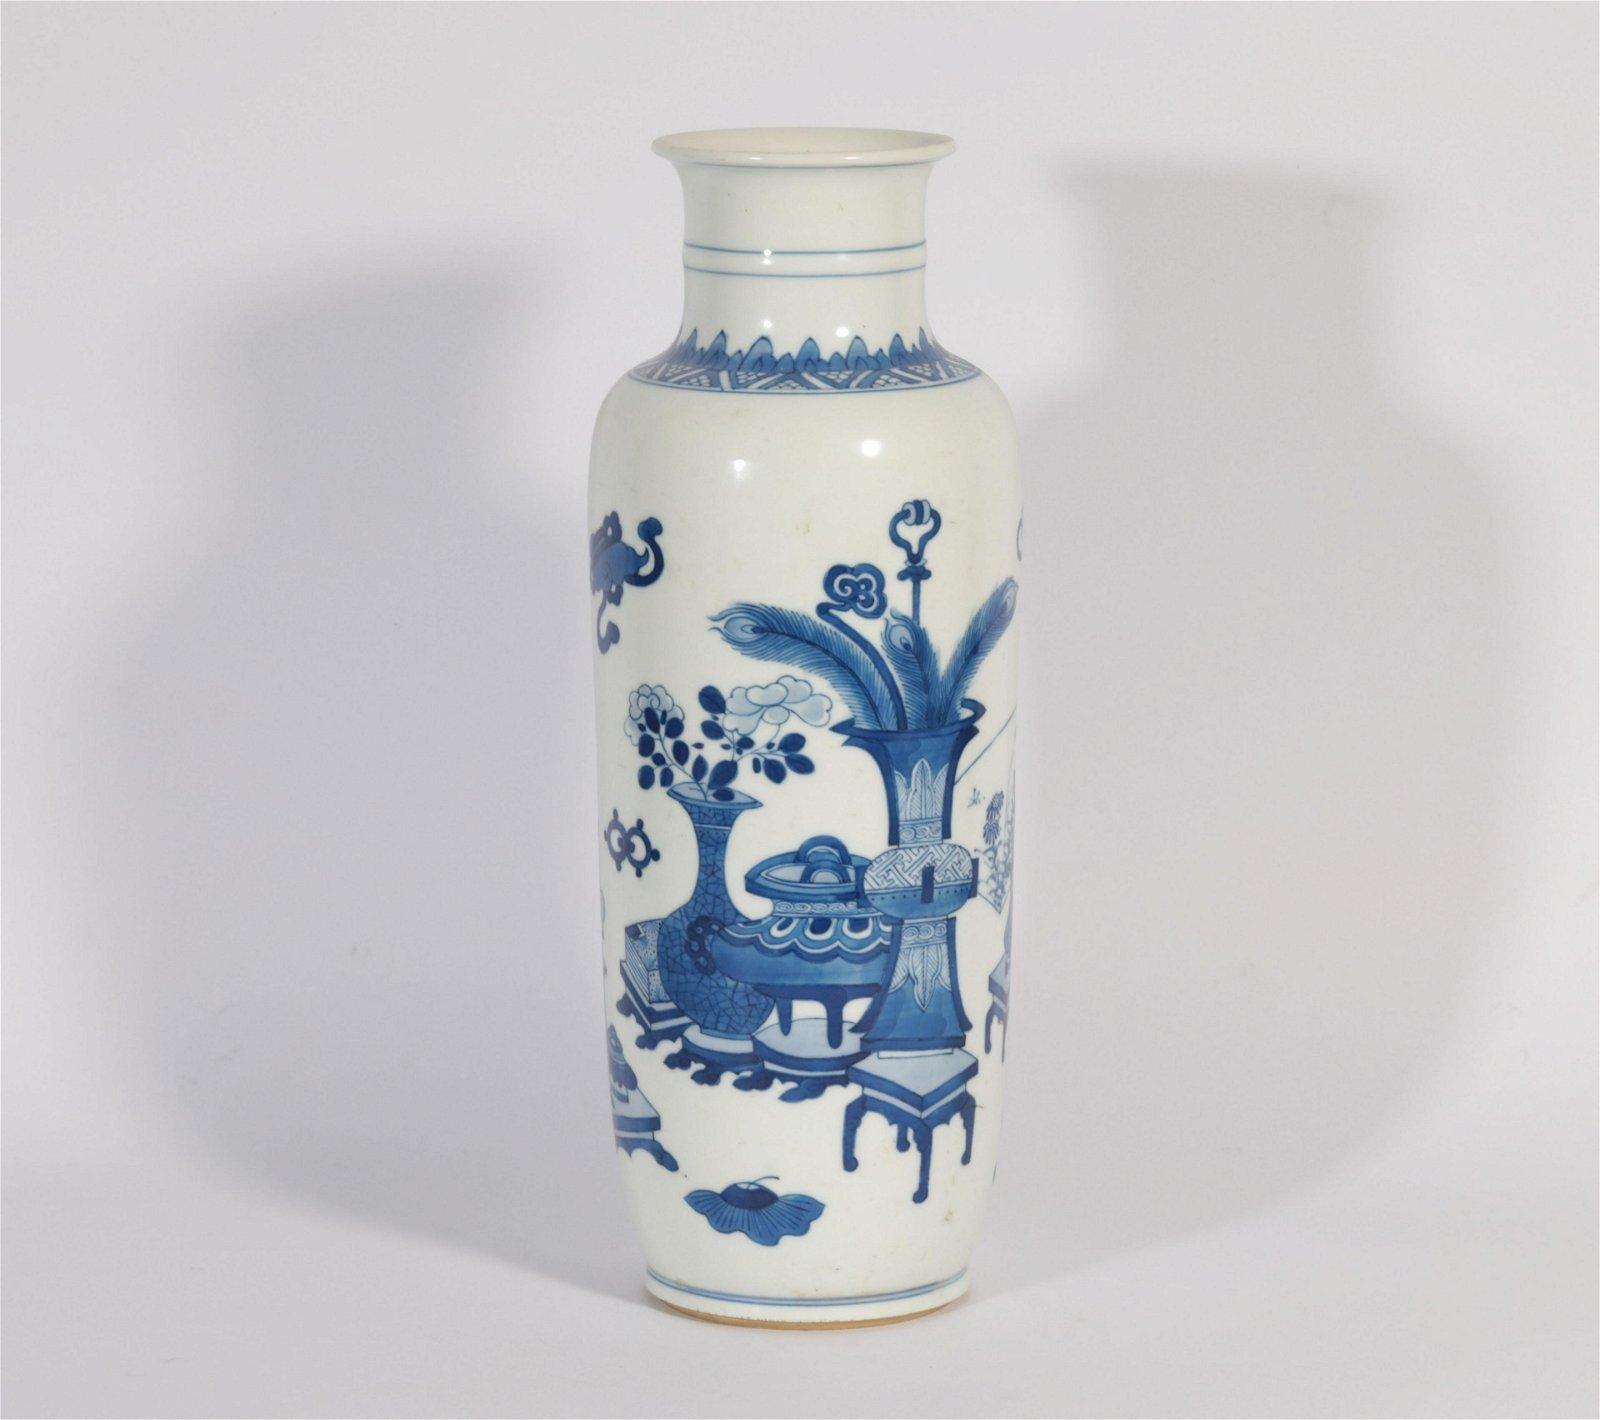 A Blue and White Mallet Vase Kangxi Period